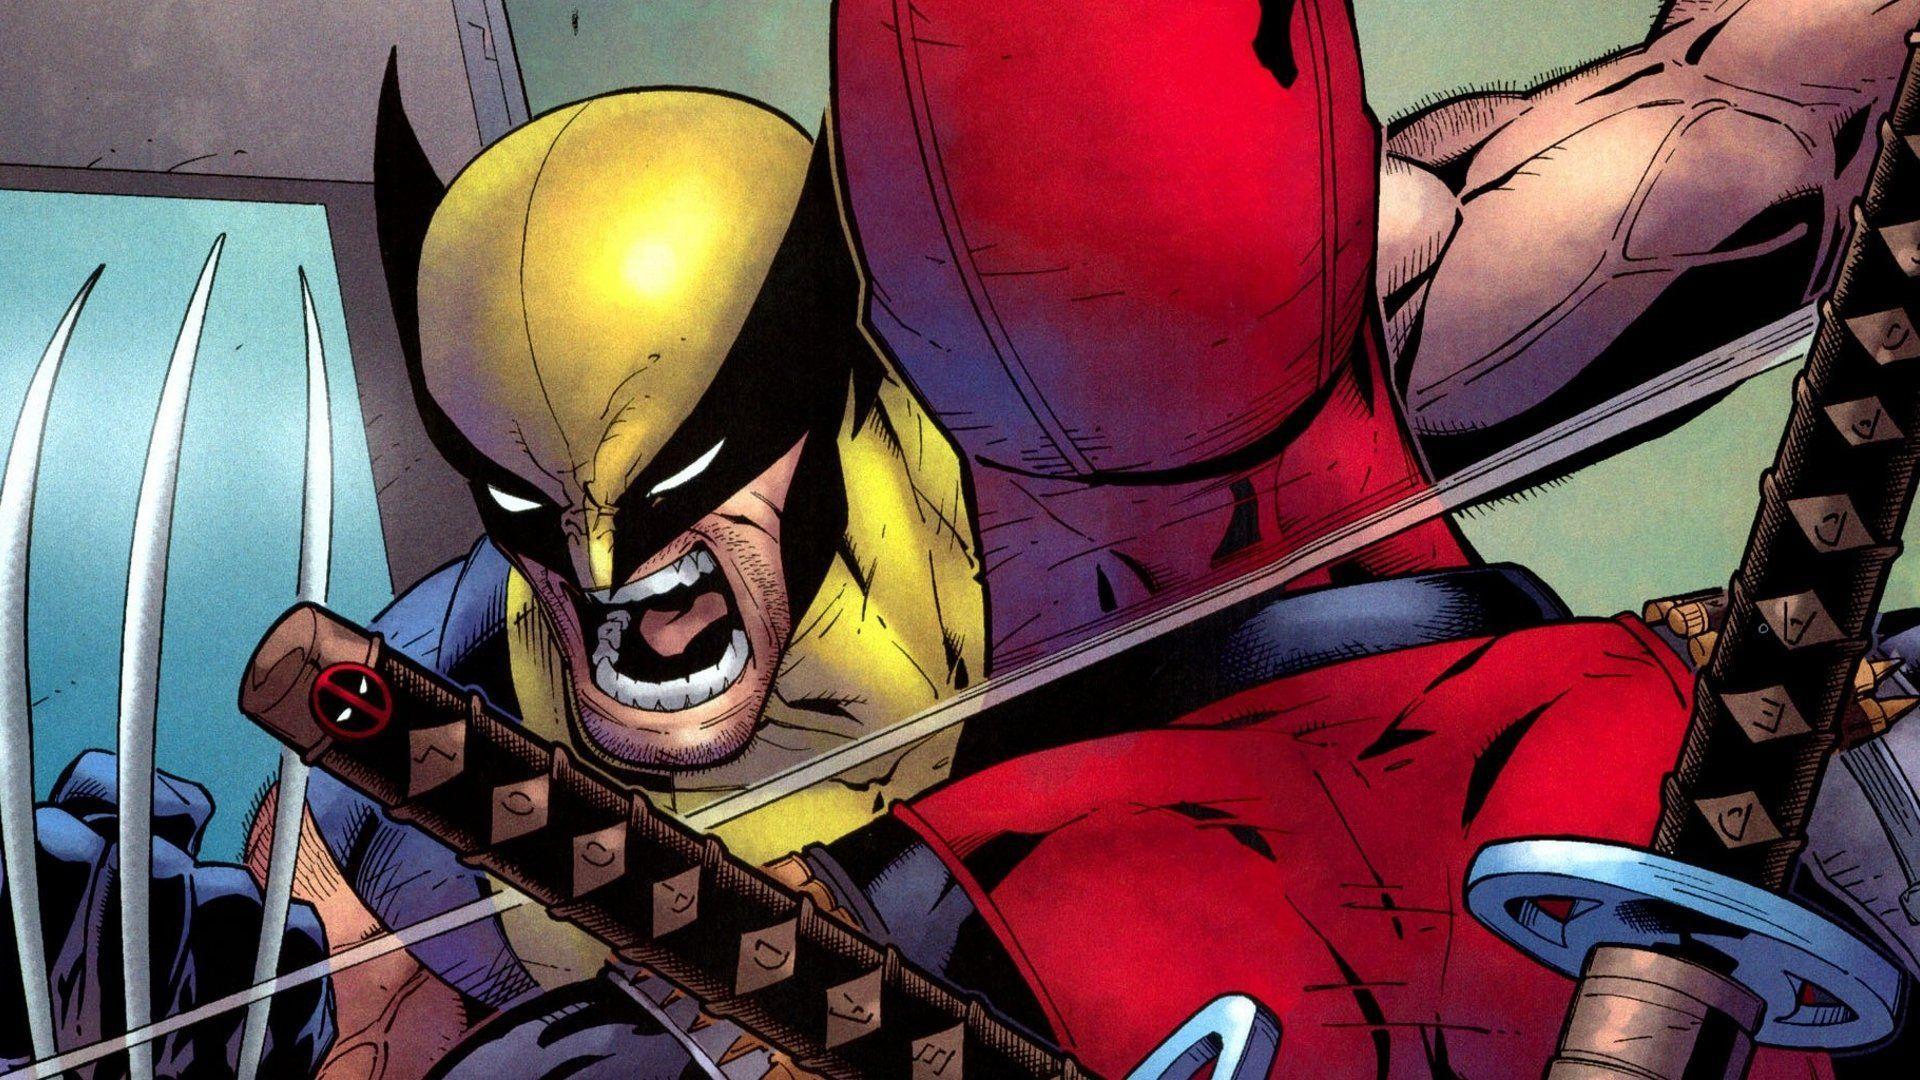 Wolverine Vs Deadpool Wallpapers Top Free Wolverine Vs Deadpool